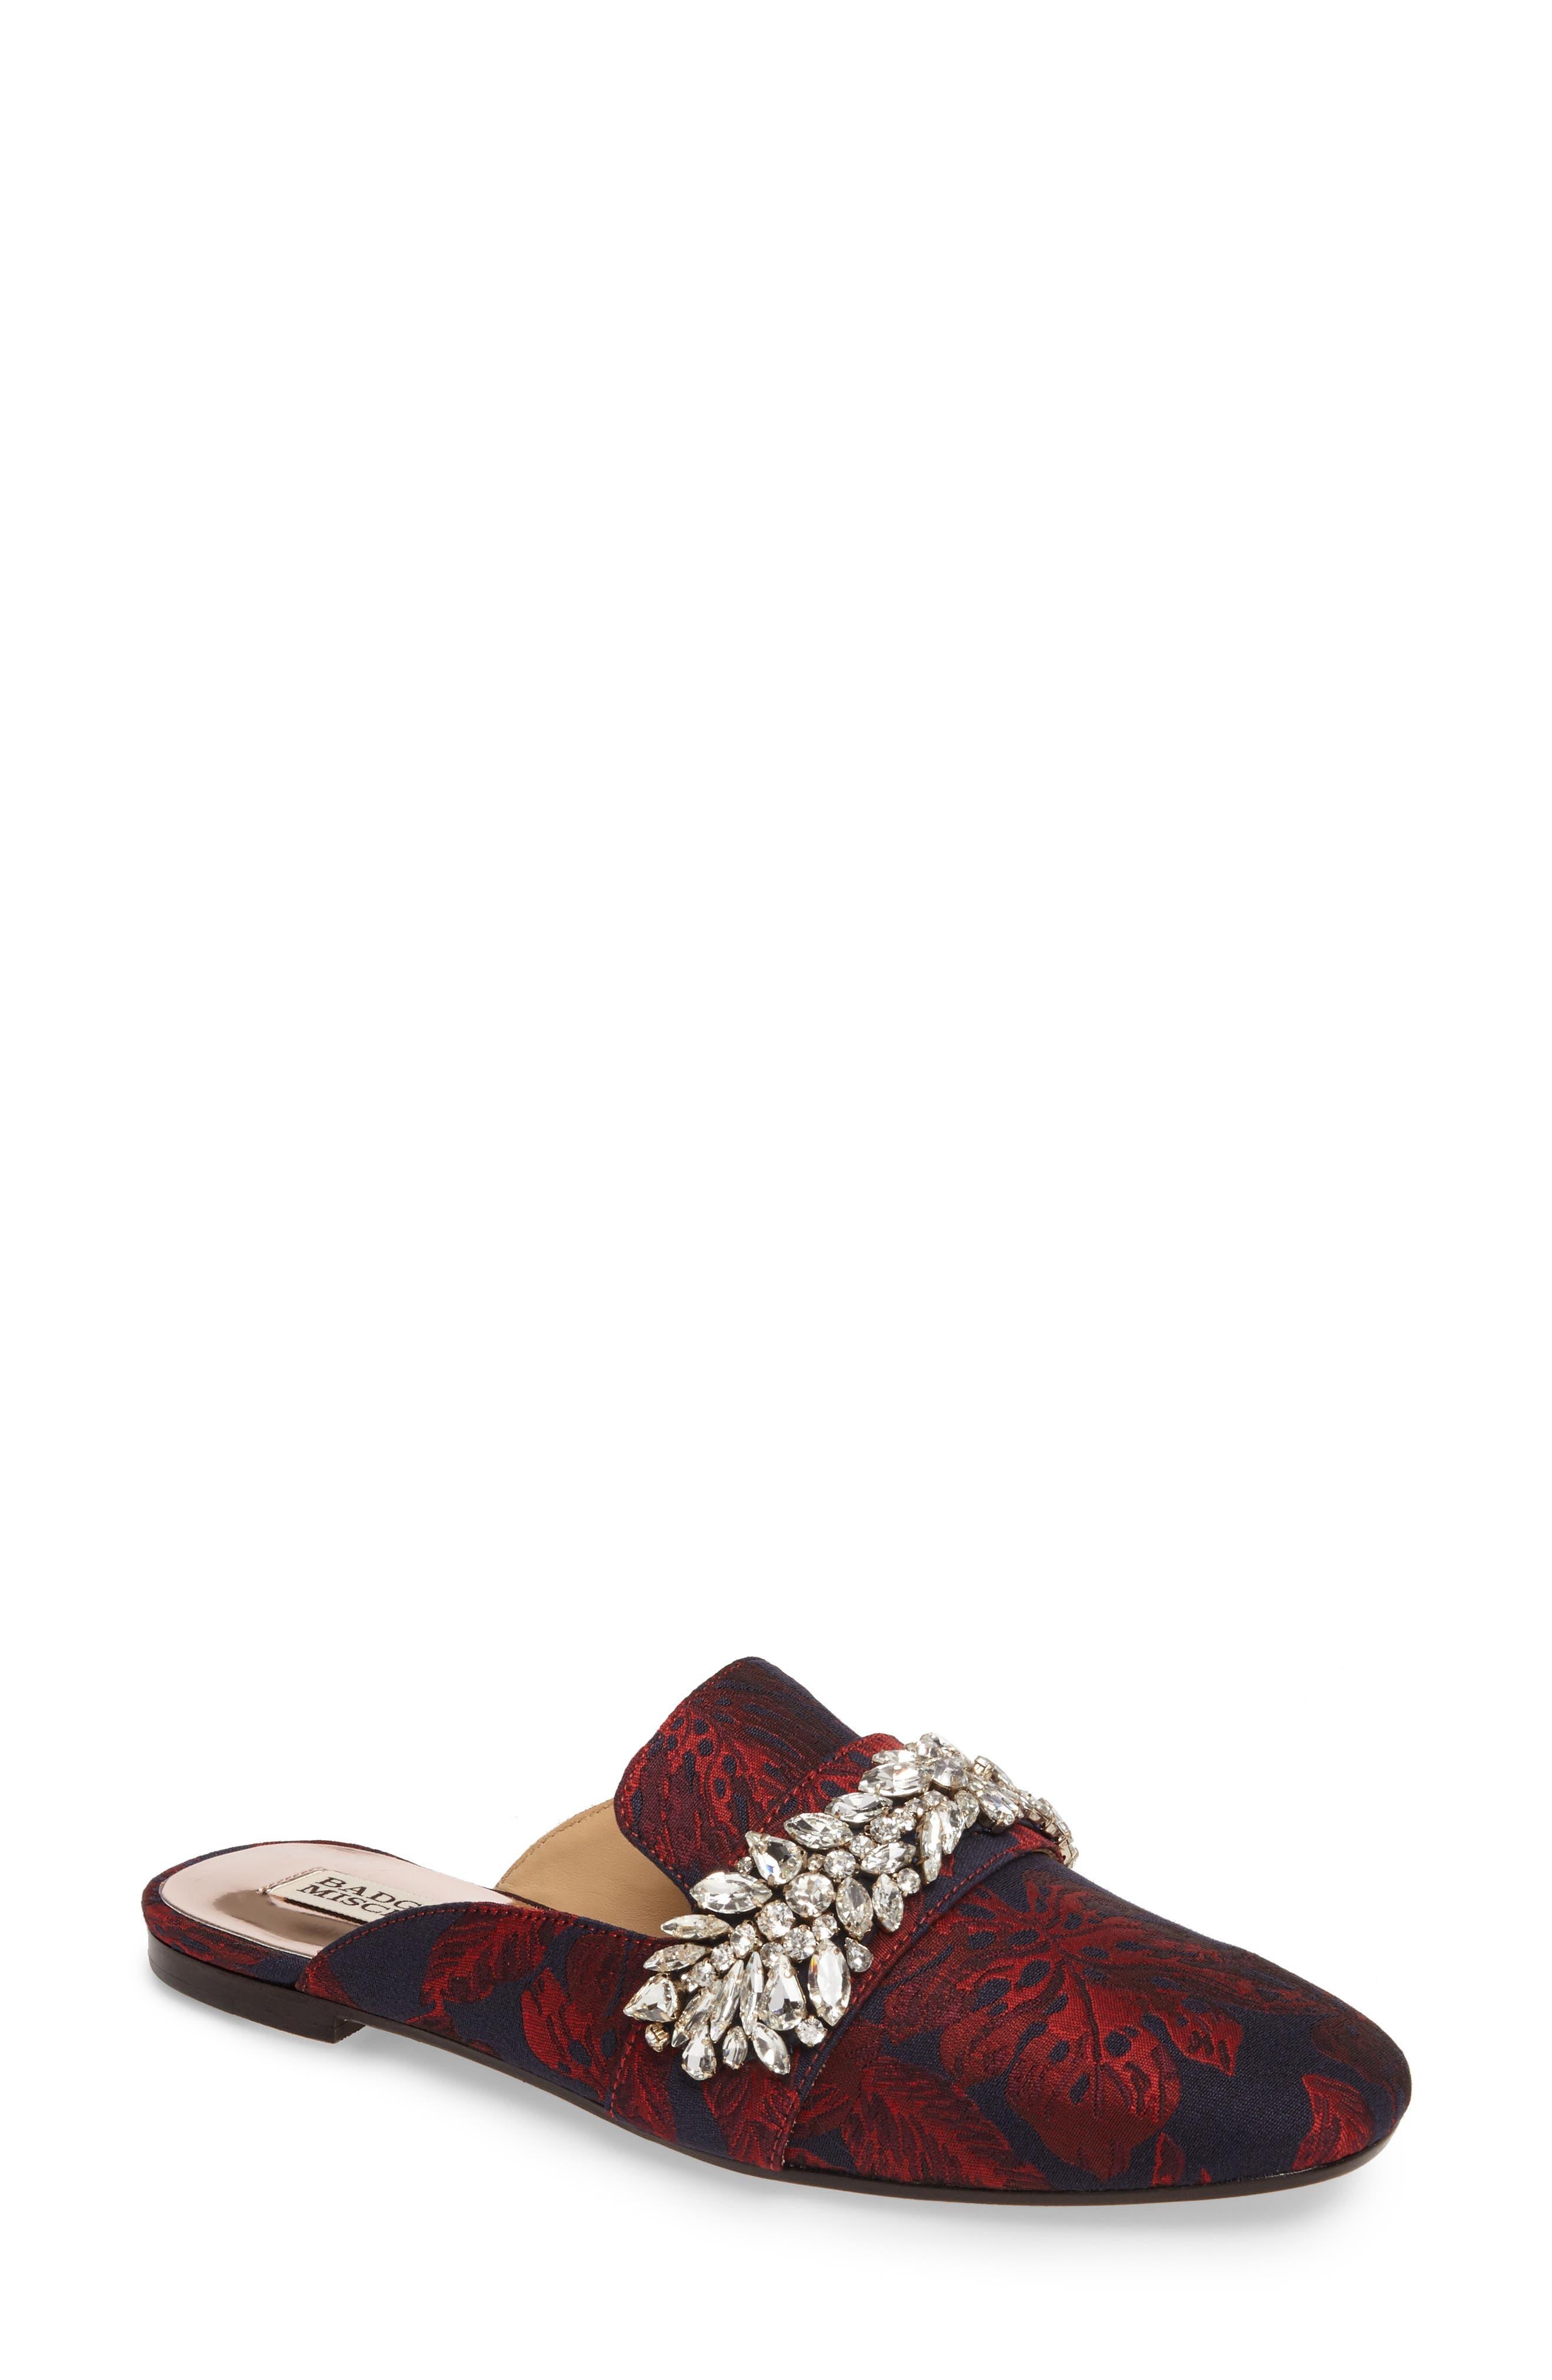 Kana Embellished Loafer Mule,                             Main thumbnail 1, color,                             Burgundy Fabric